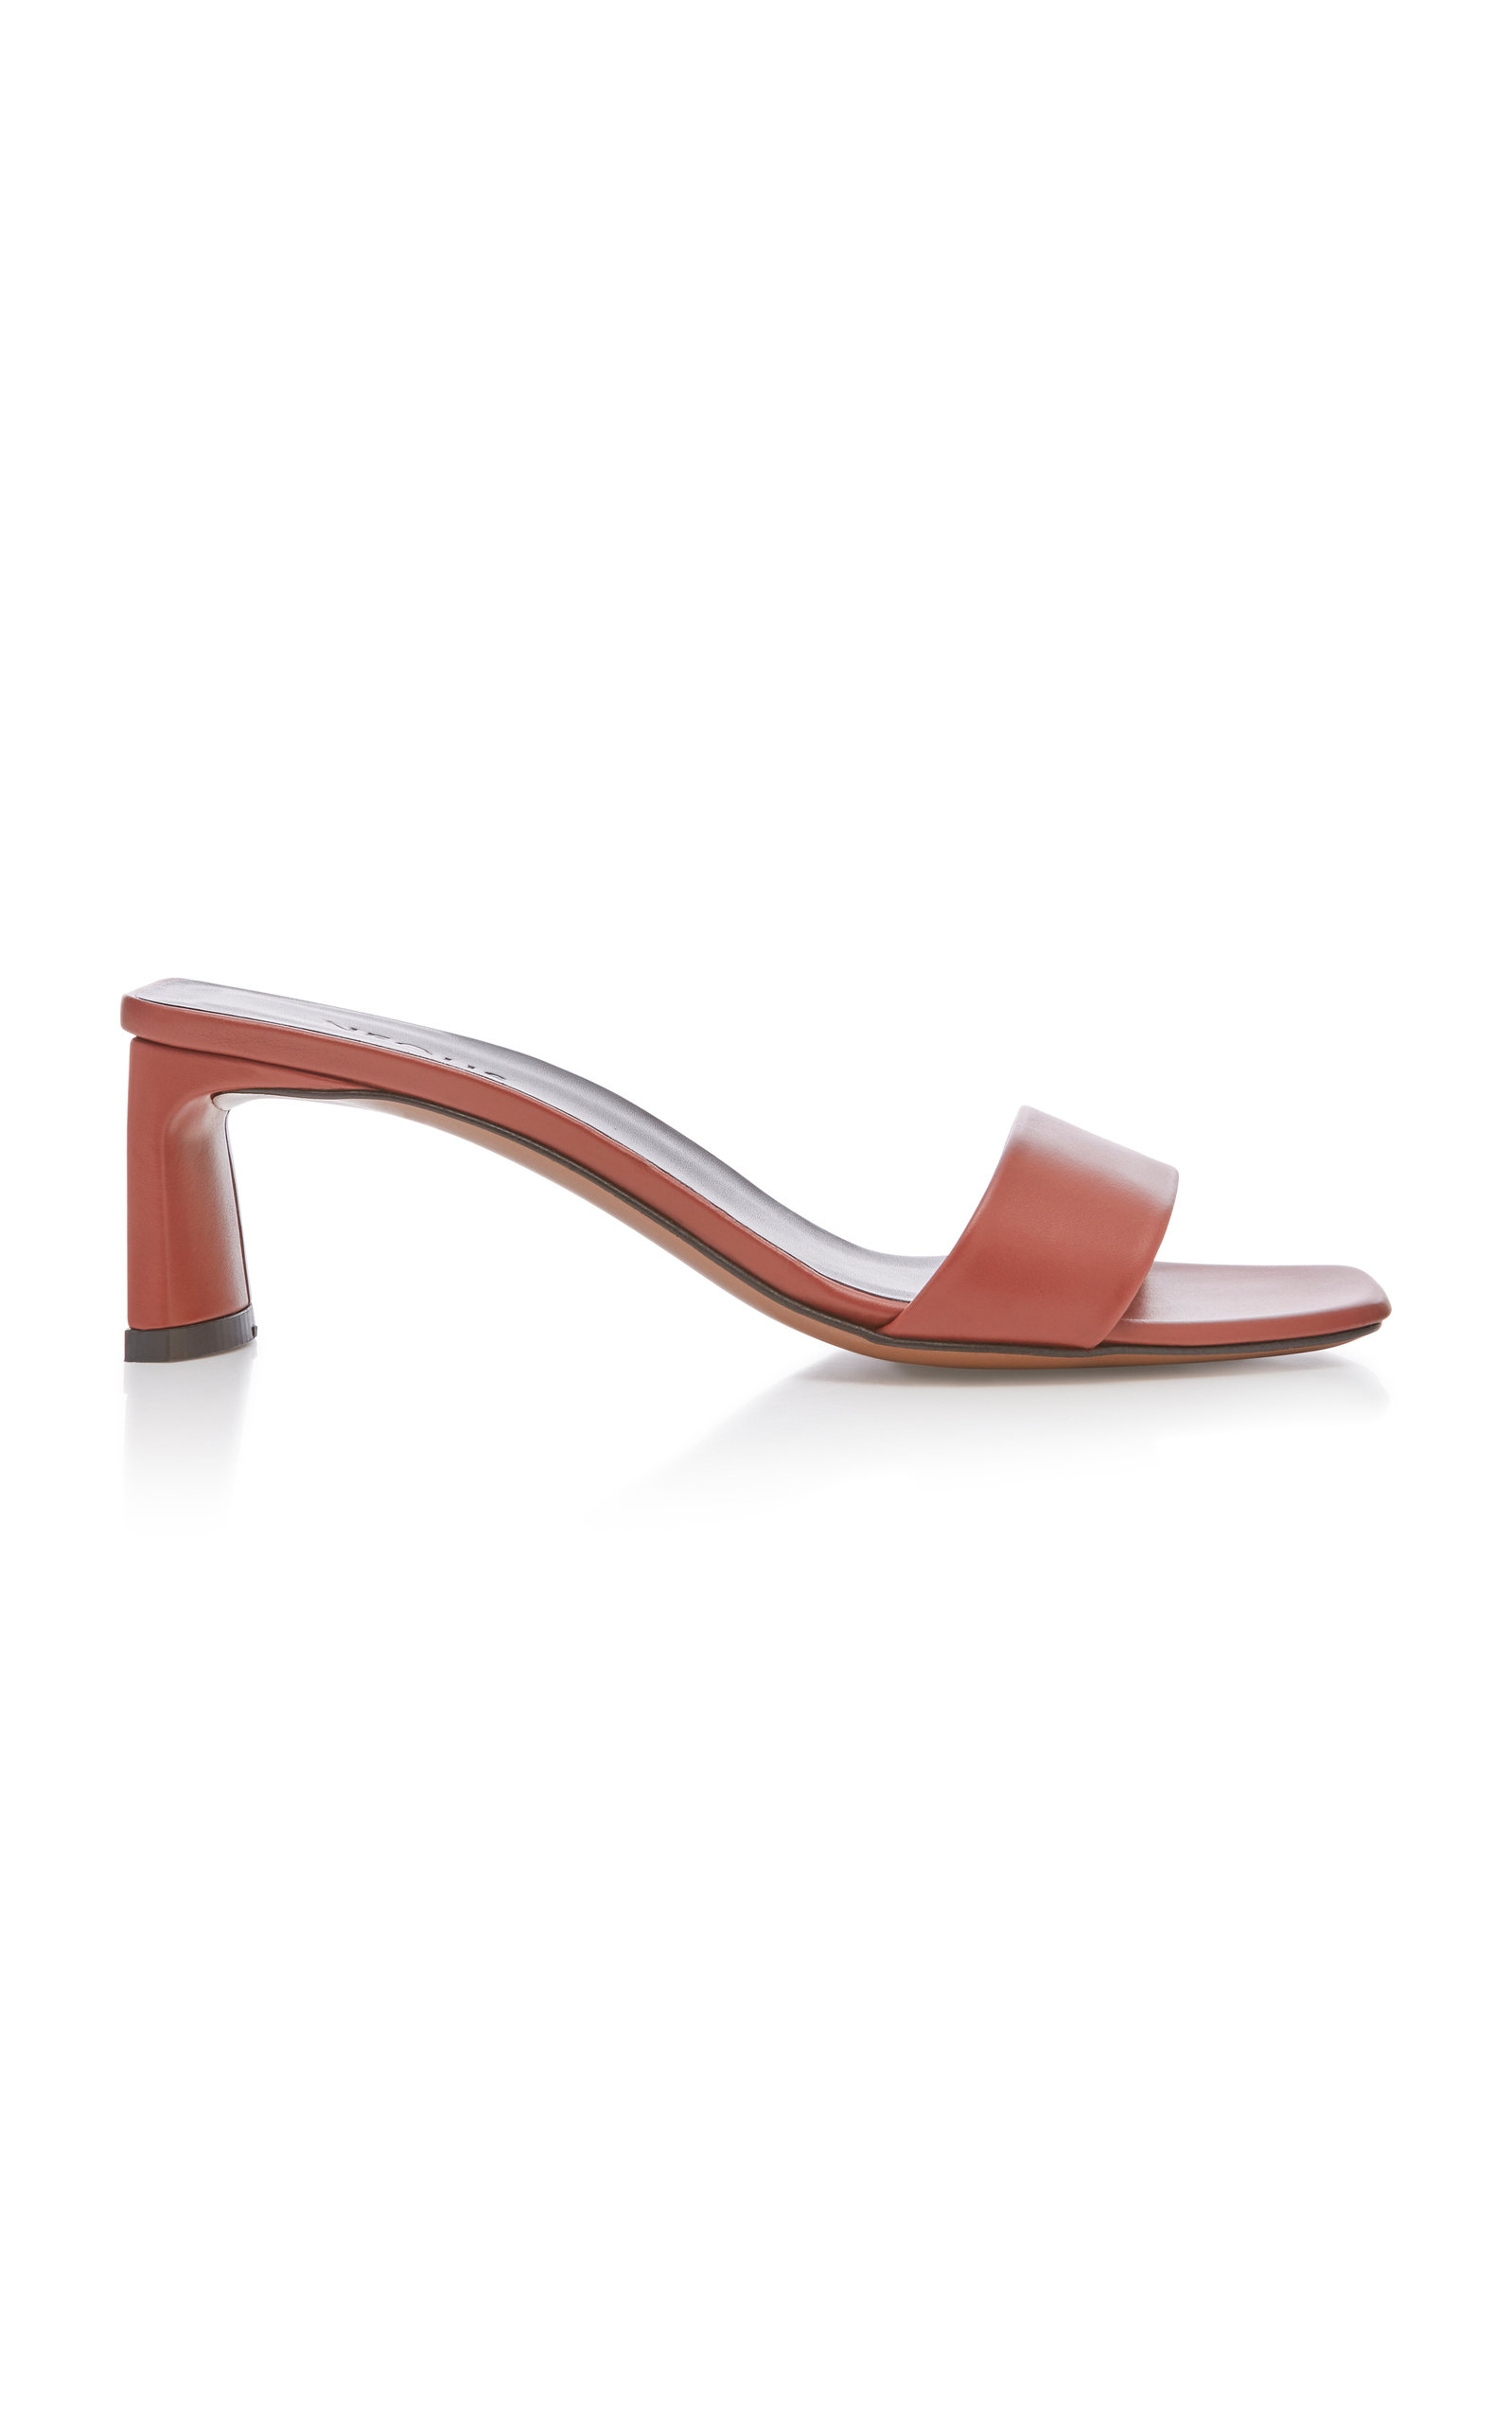 Neous Sandals LEATHER SANDALS